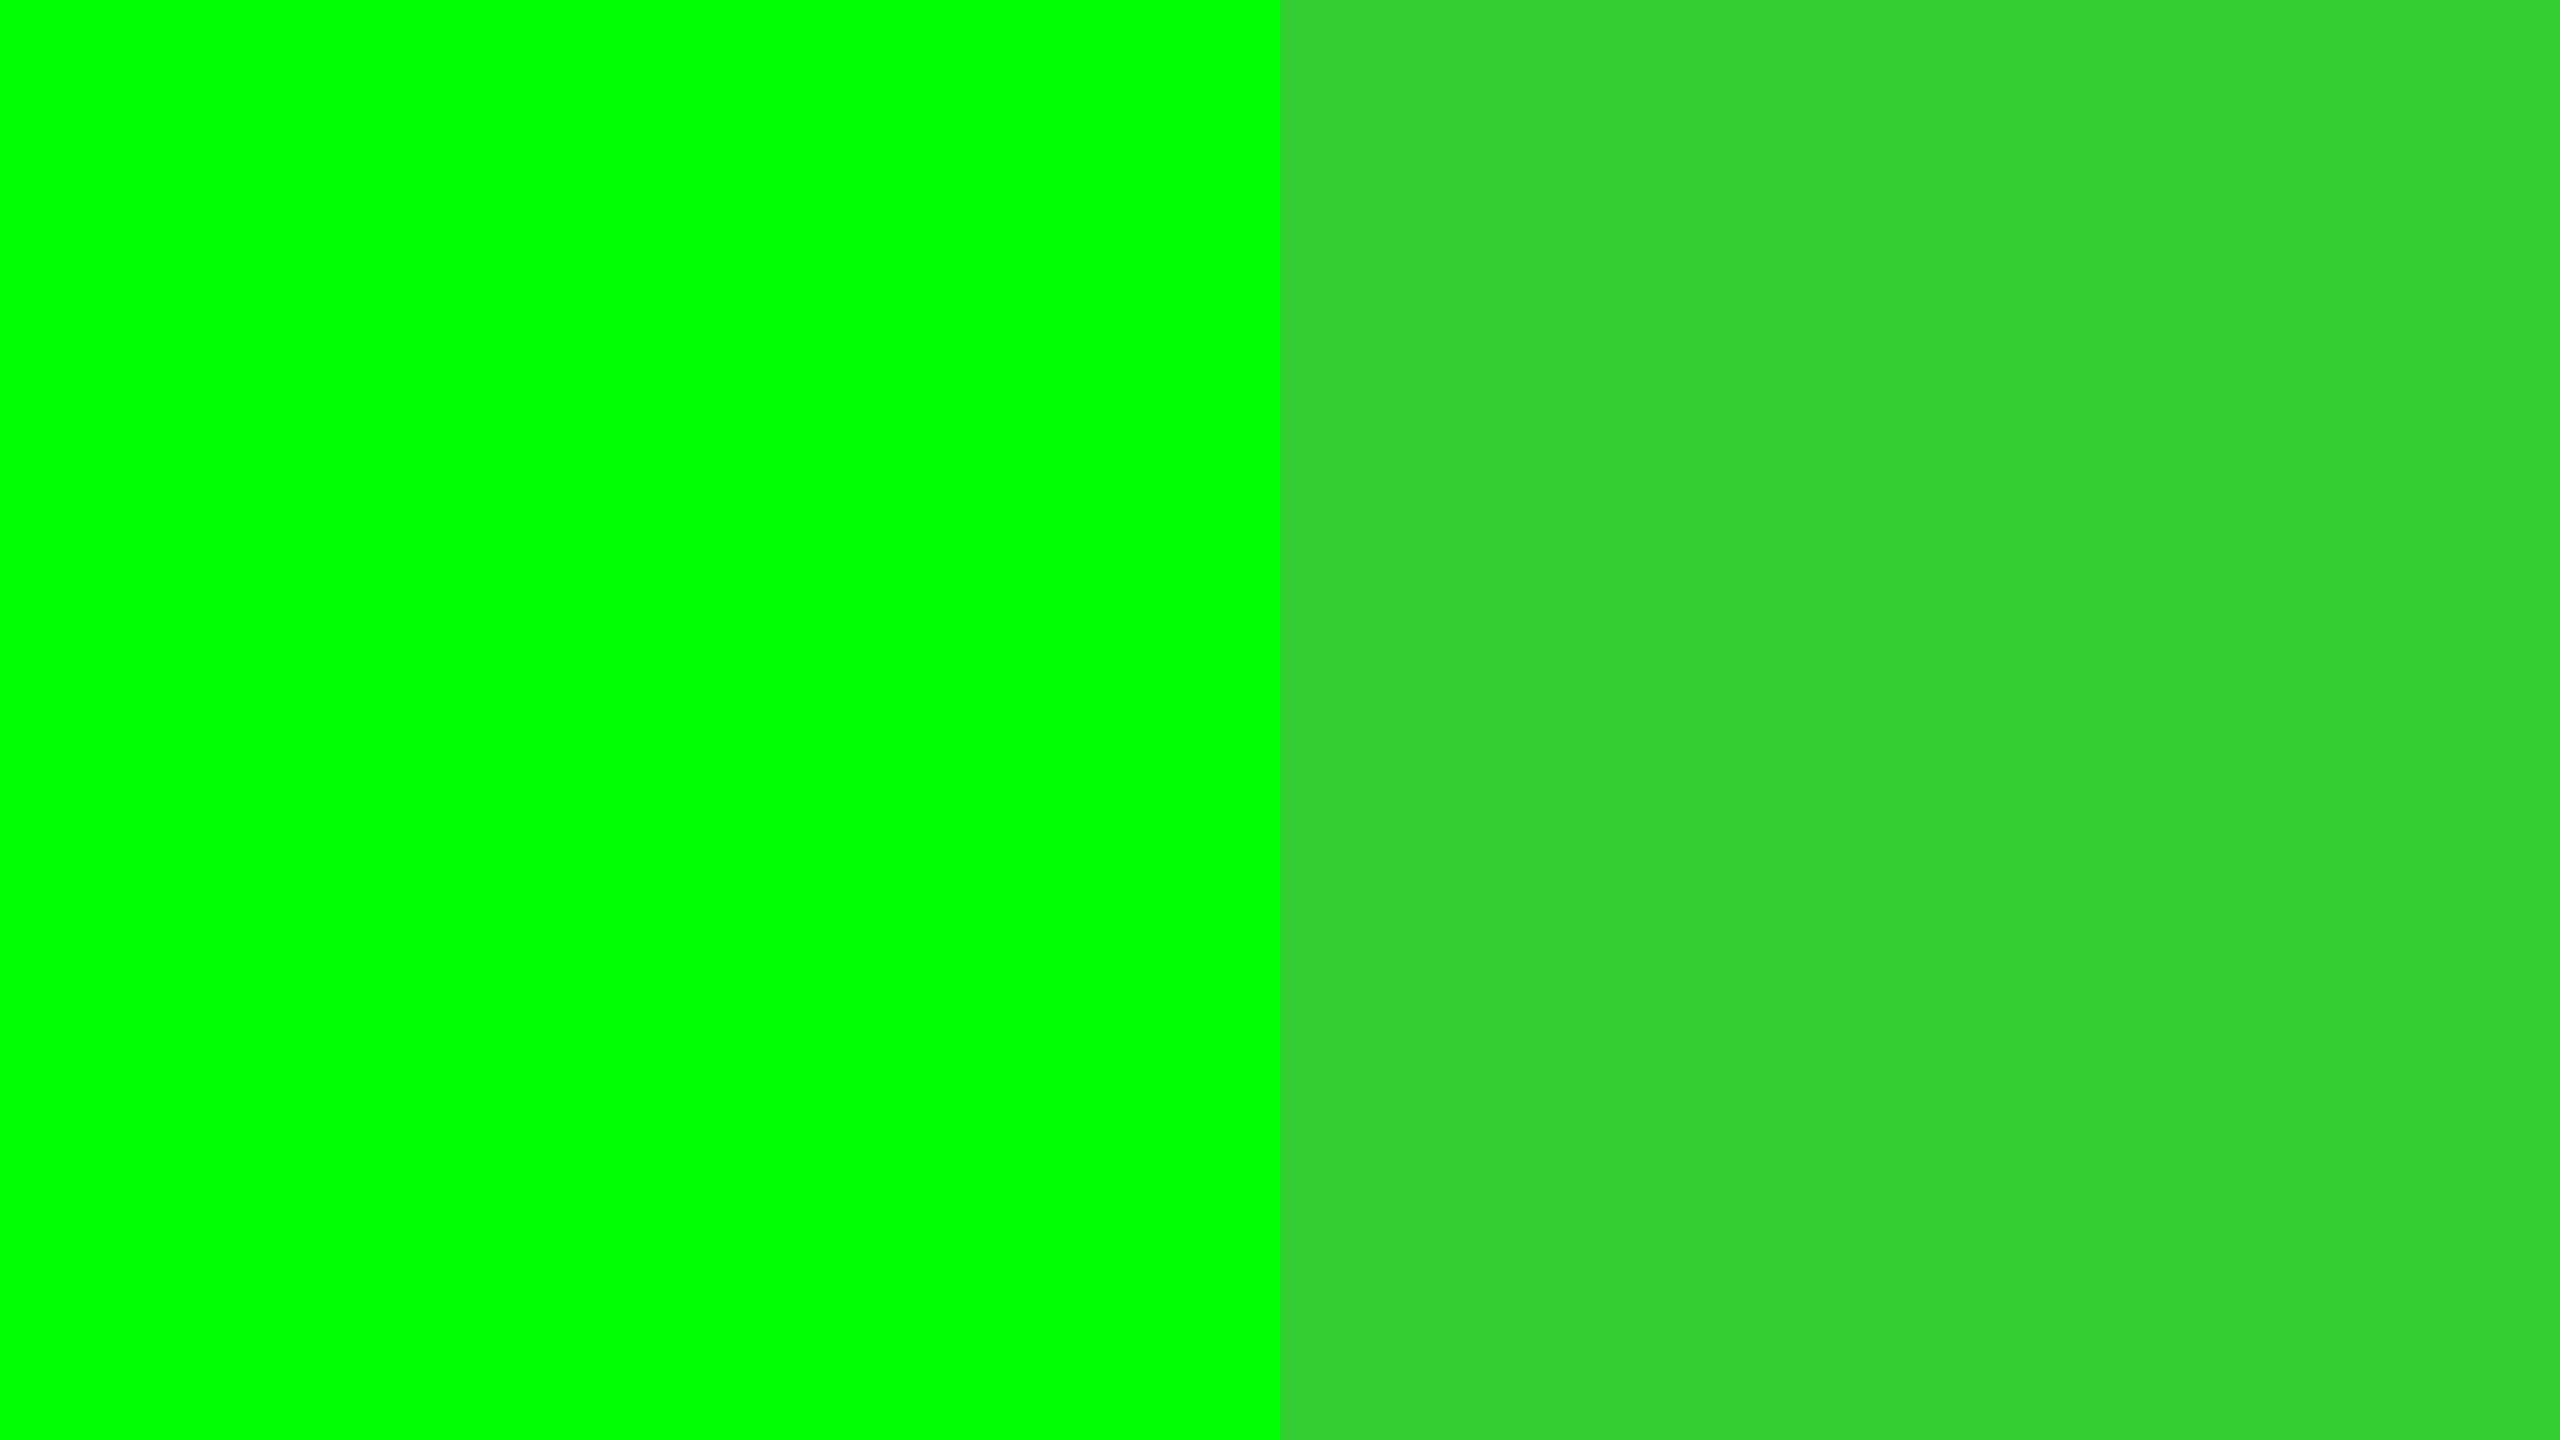 lime green background wallpapersafari